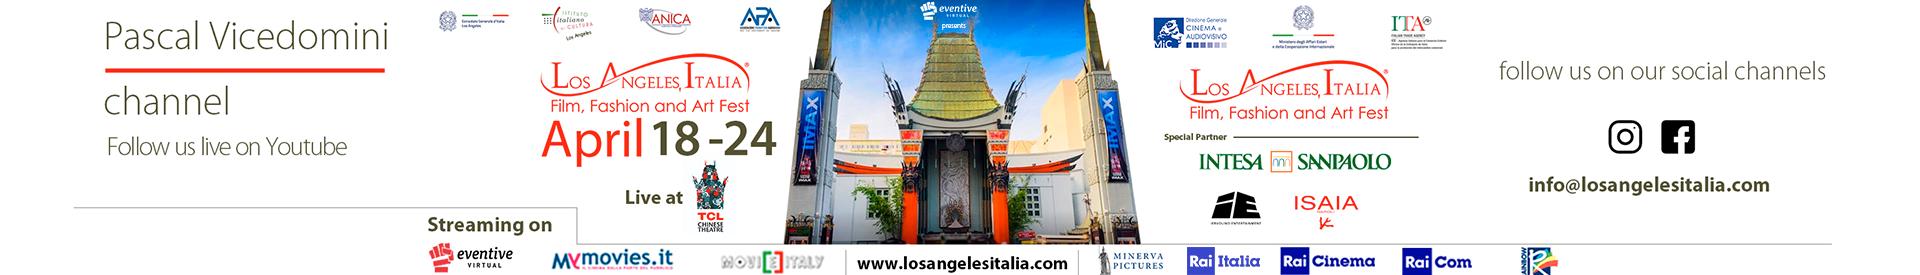 Los Angeles, Italia Film Festival